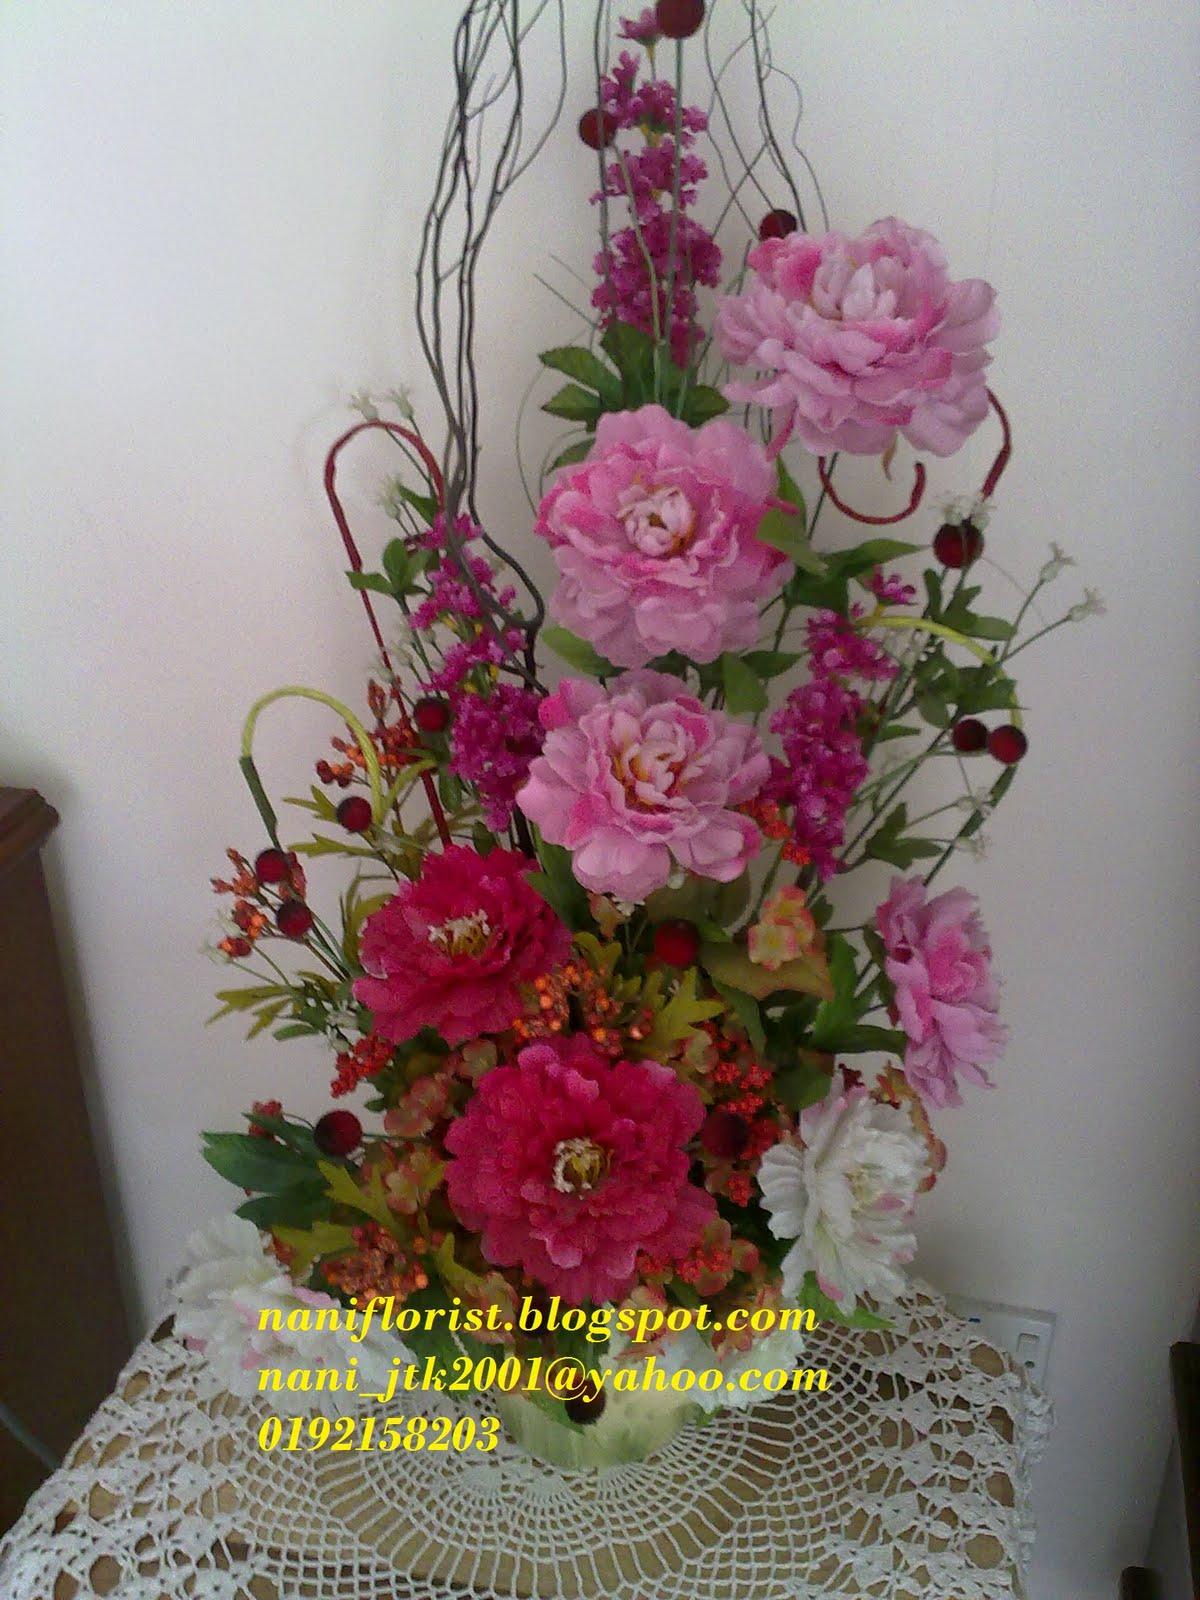 Nani Florist Jambangan Bunga Artifical Menghiasi Di Setiap